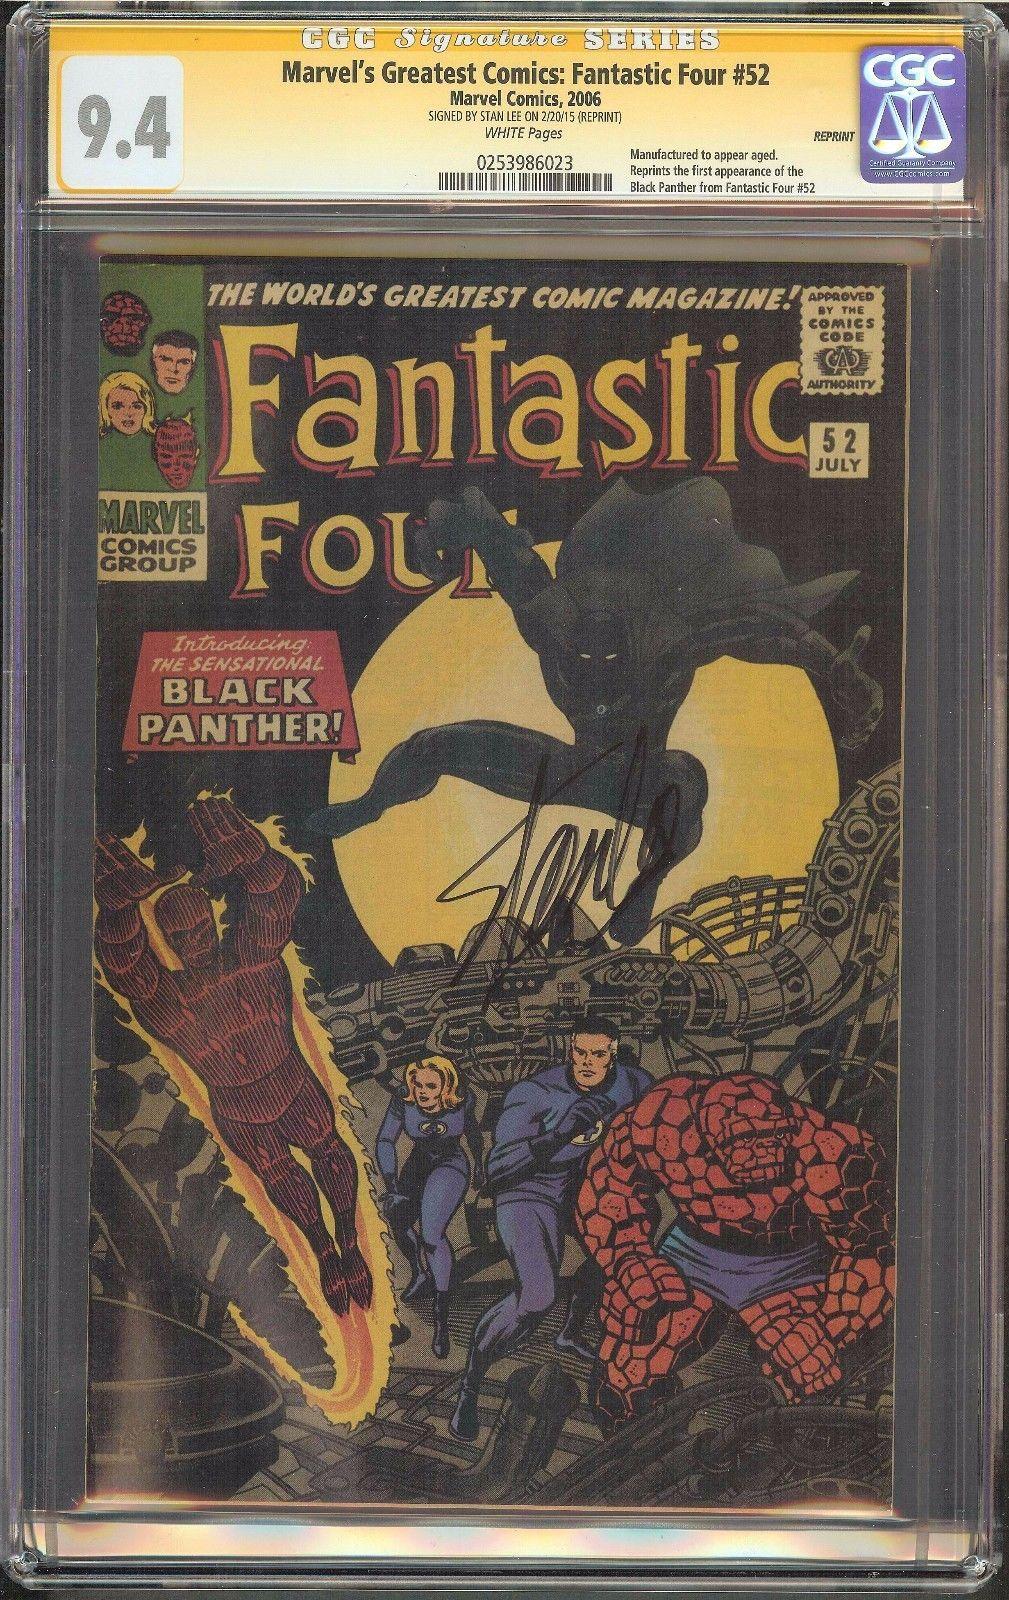 Marvel's Greatest Comics: Fantastic Four #52 CGC 9.4 NM SIGNED STAN LEE REPRINT